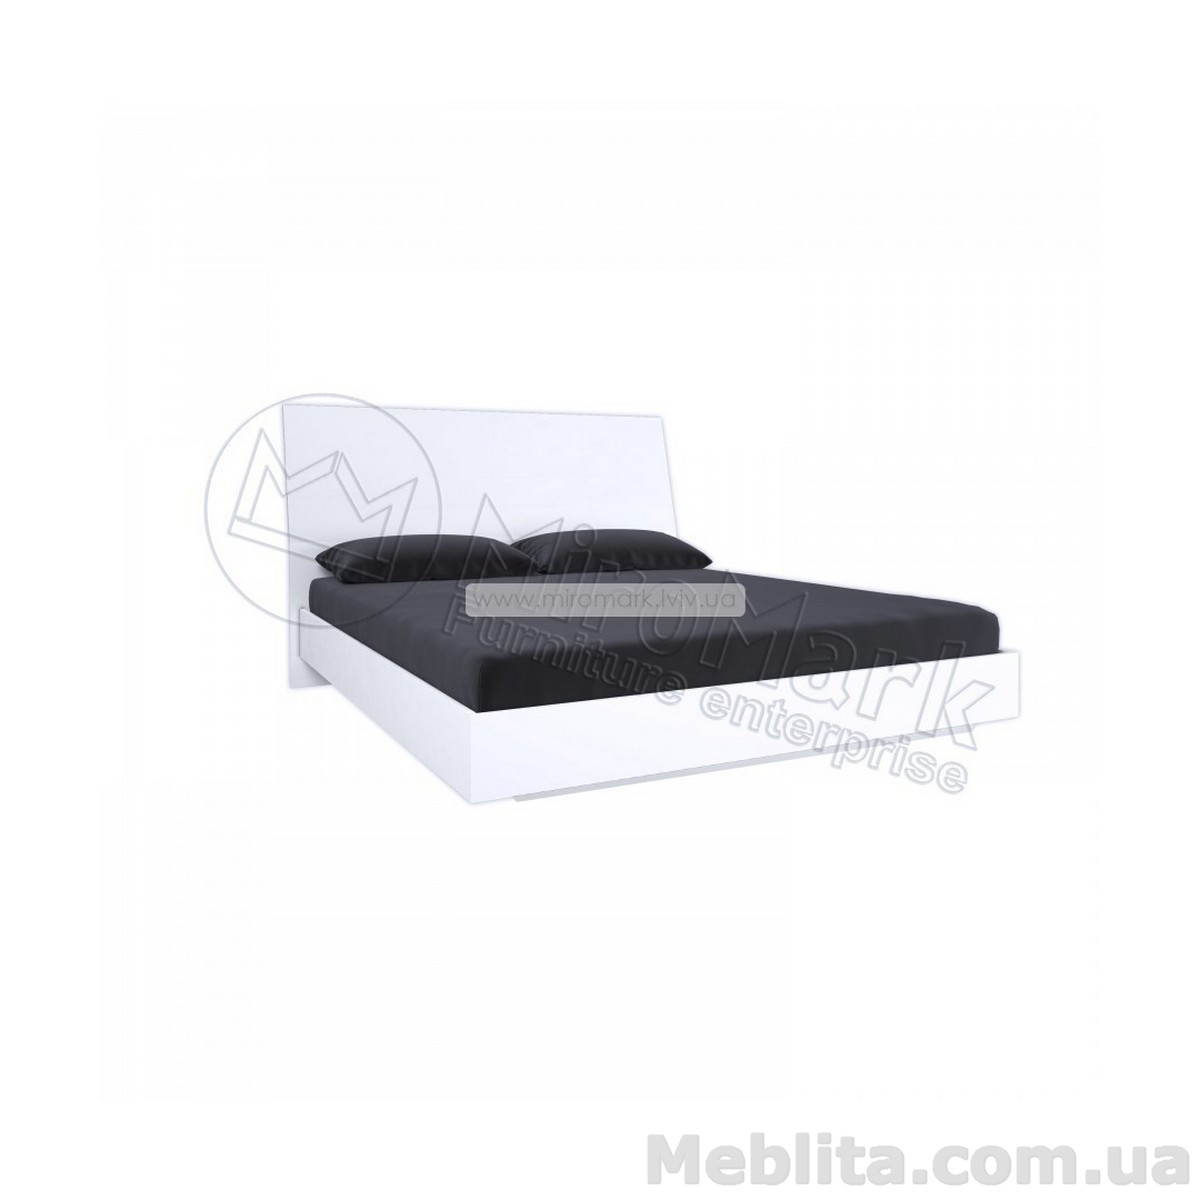 Рома кровать 180x200